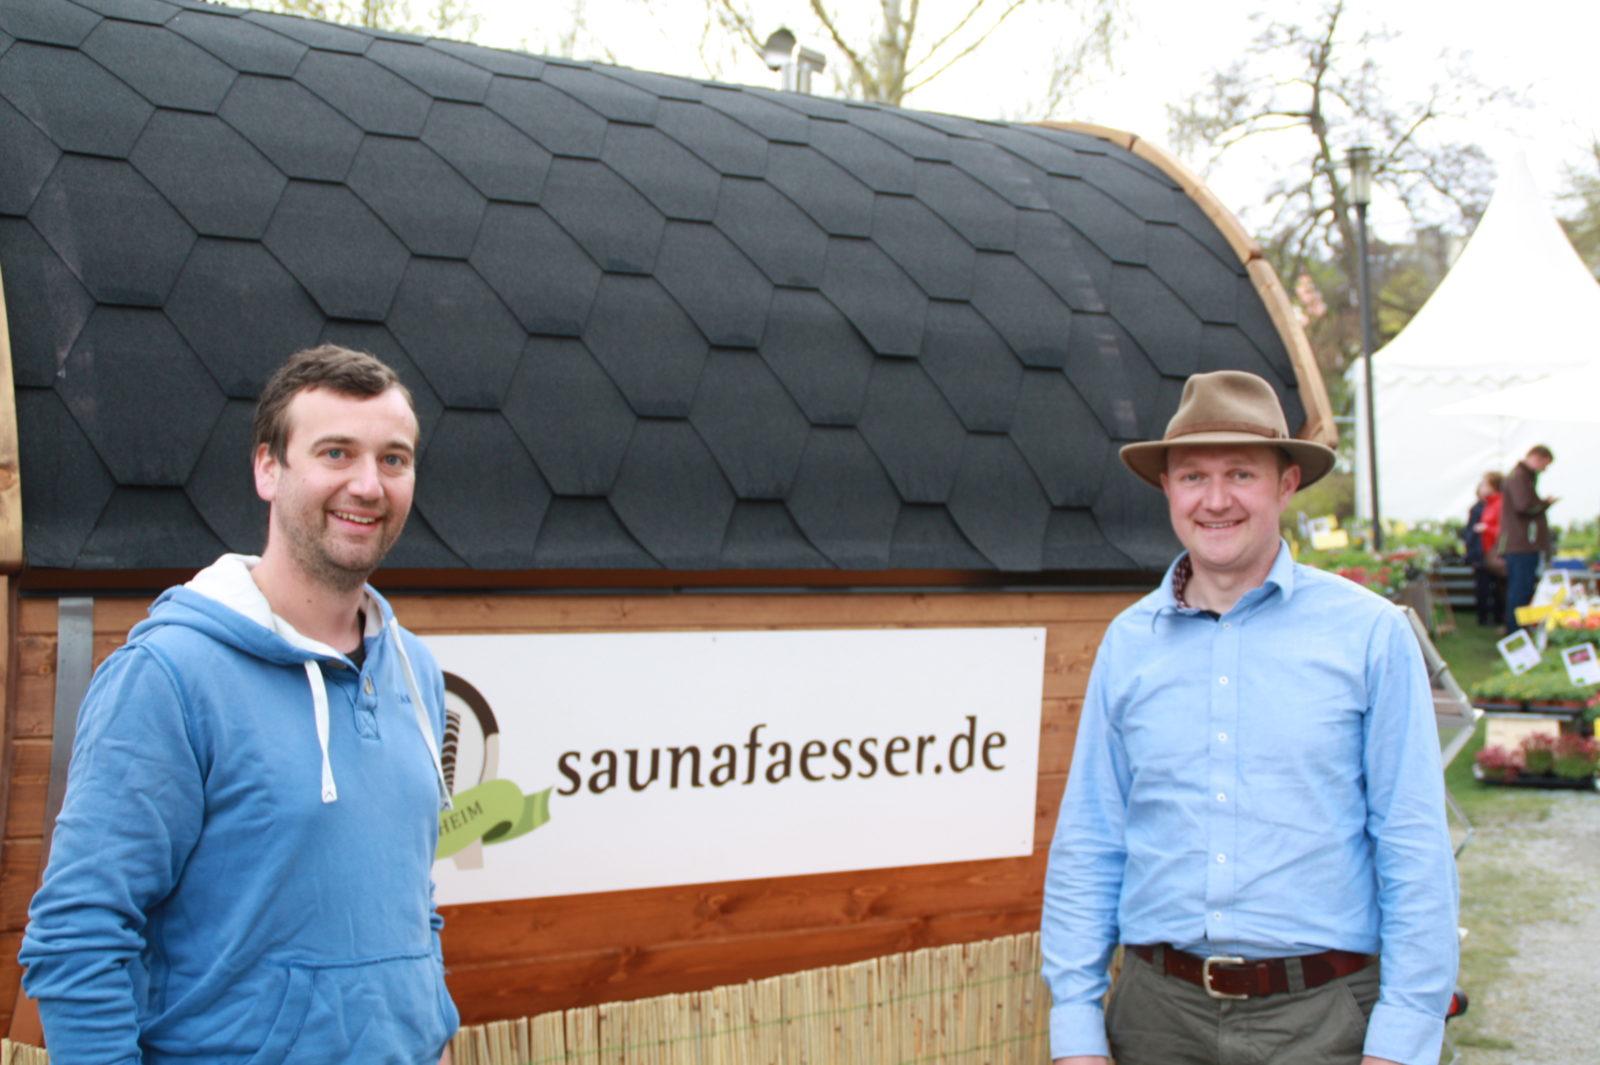 saunafaesser-team